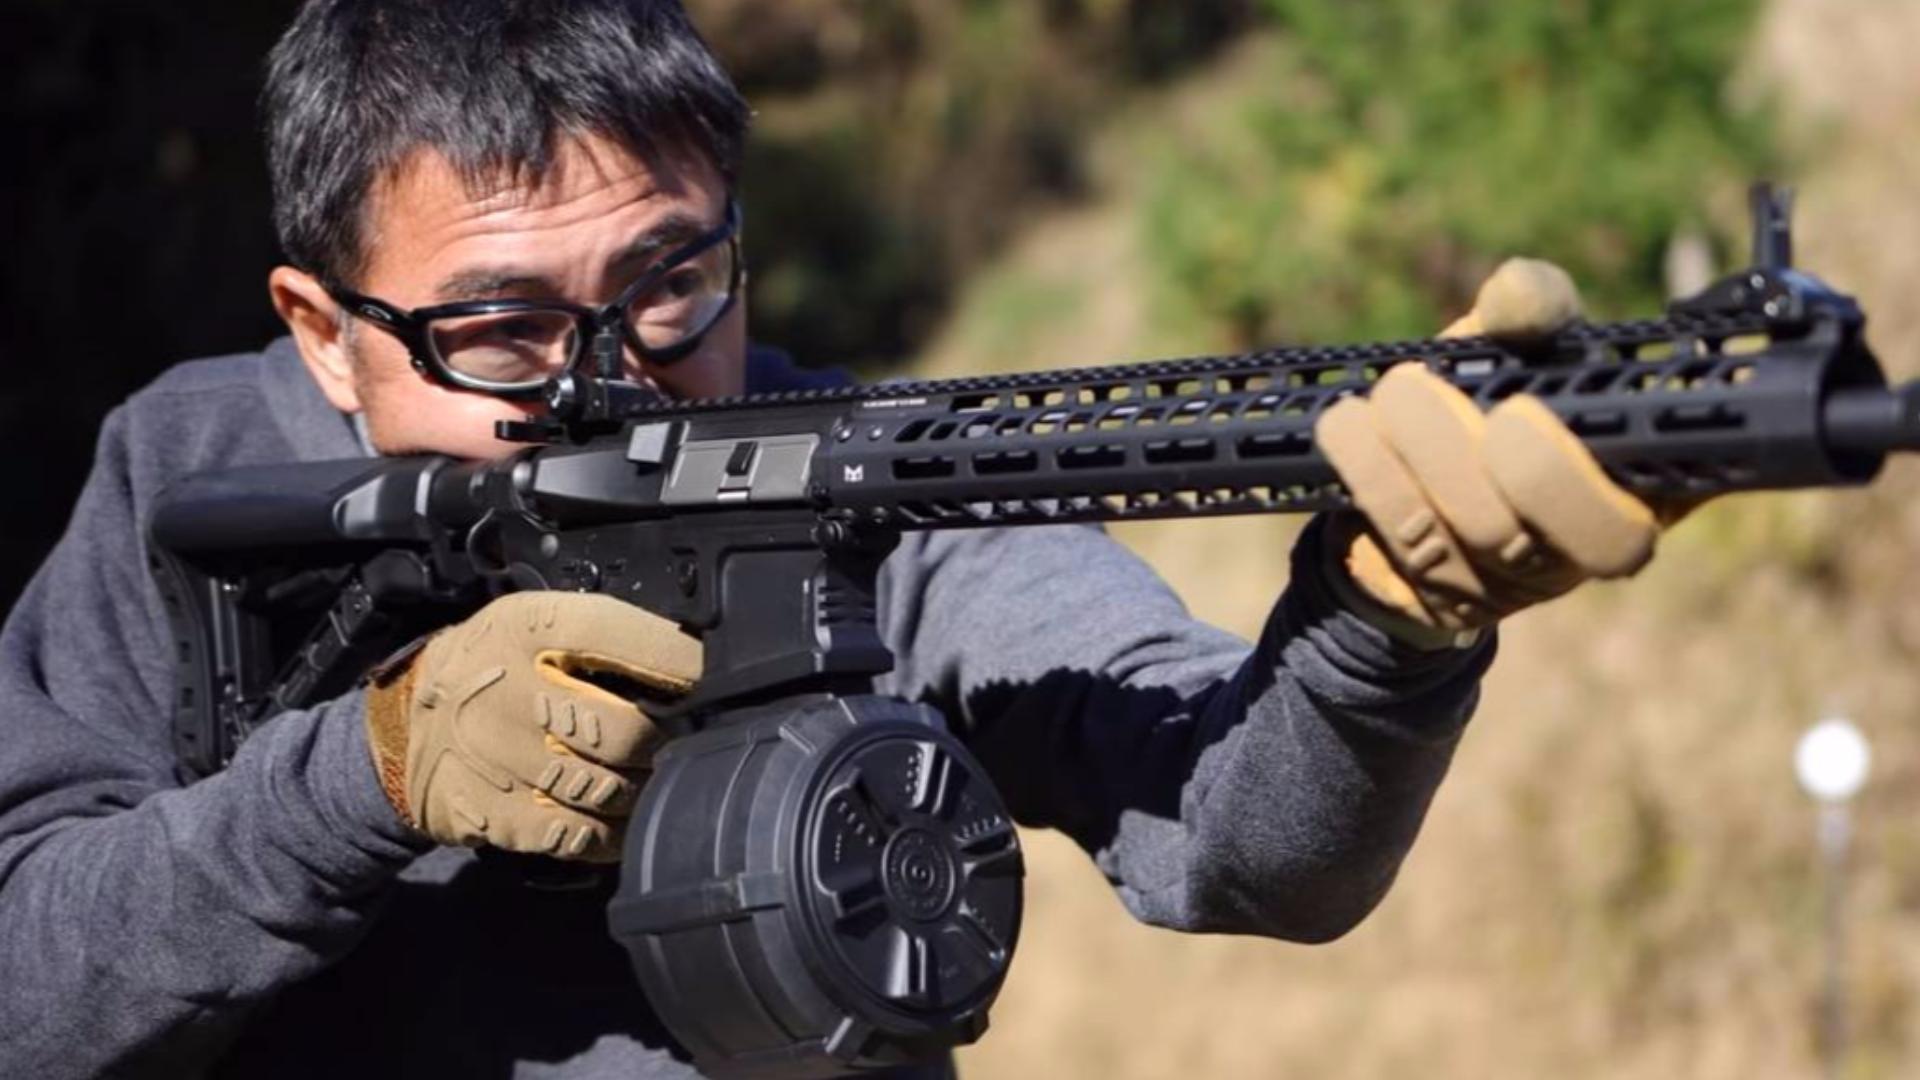 M4 2300连续鼓杂志+G&G TR16 MBR556WH电动枪麦克堺气枪